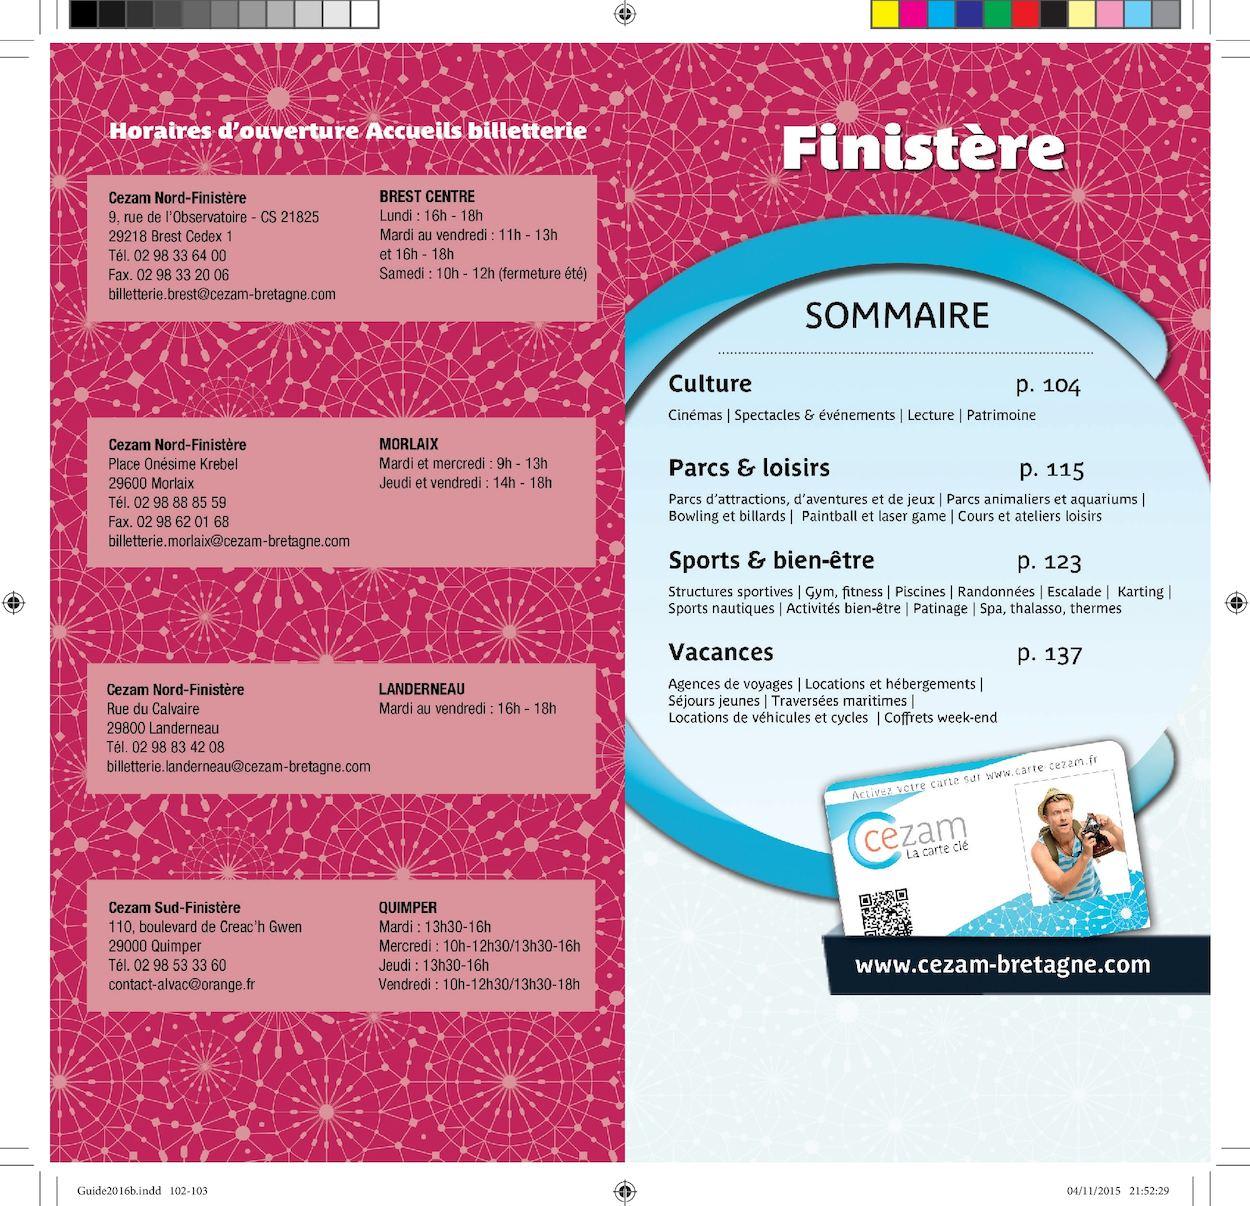 Carte Cezam Sud Finistere.Calameo Guide Cezam Breatgne 2016